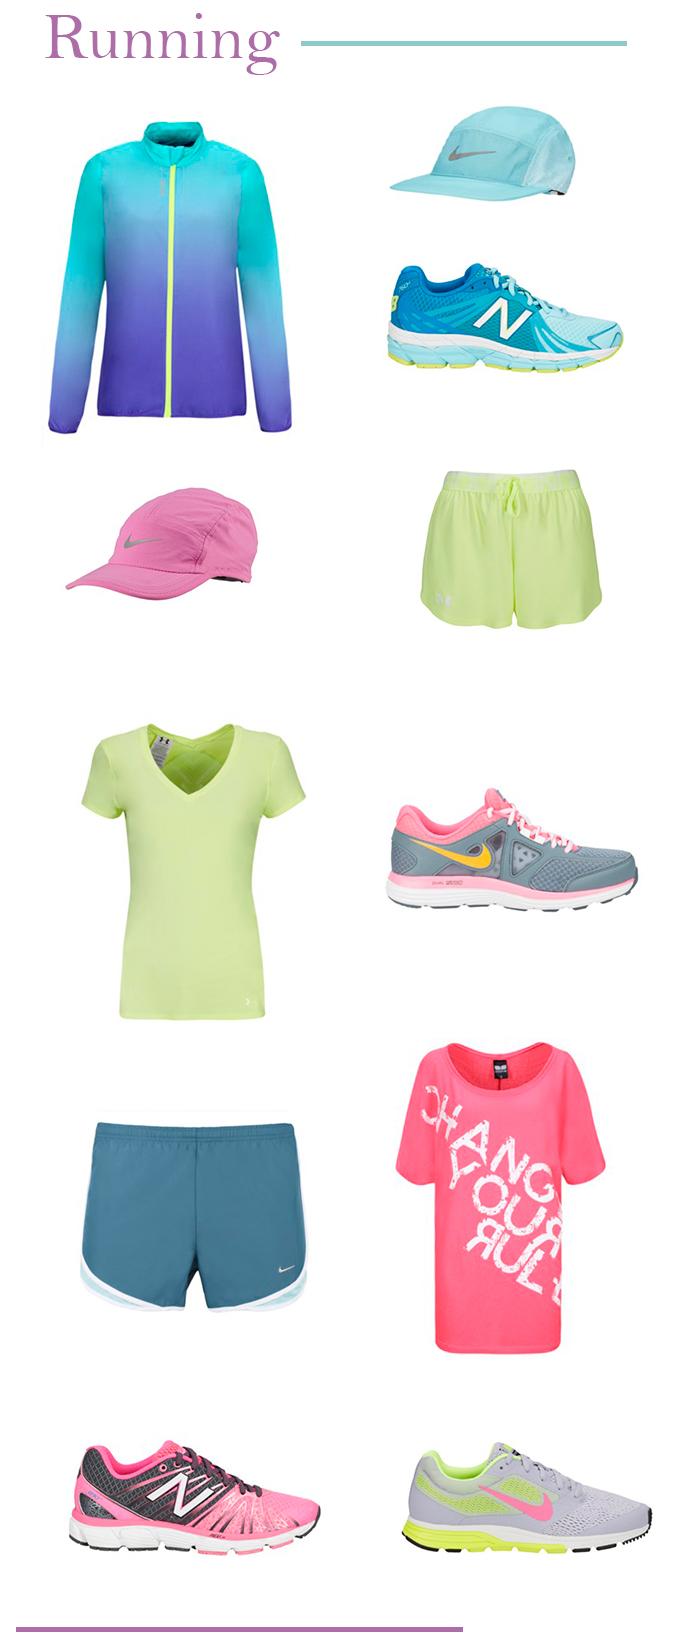 sportzone running